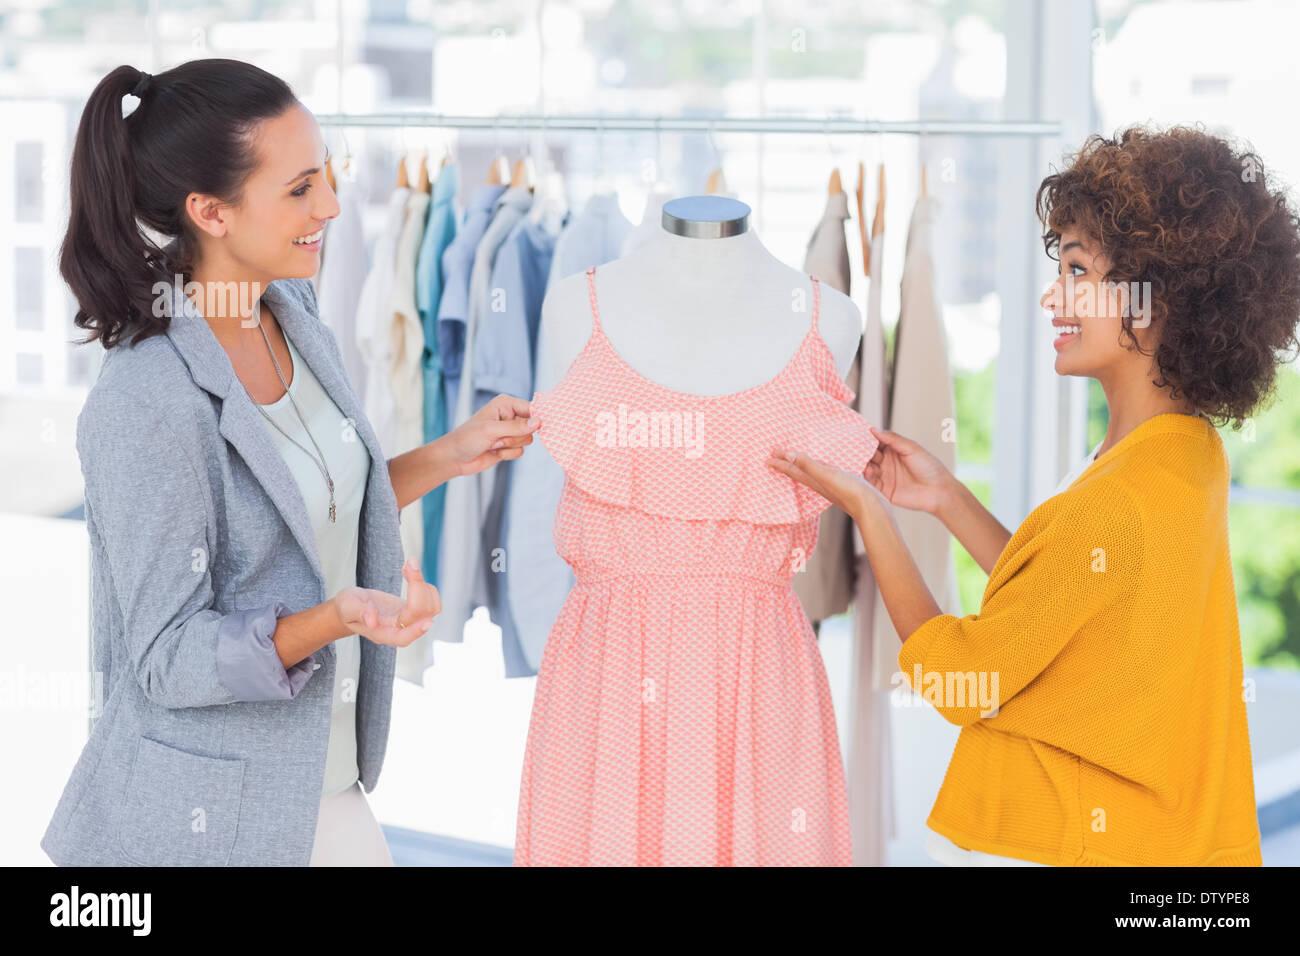 Dress Maker Imágenes De Stock & Dress Maker Fotos De Stock - Alamy